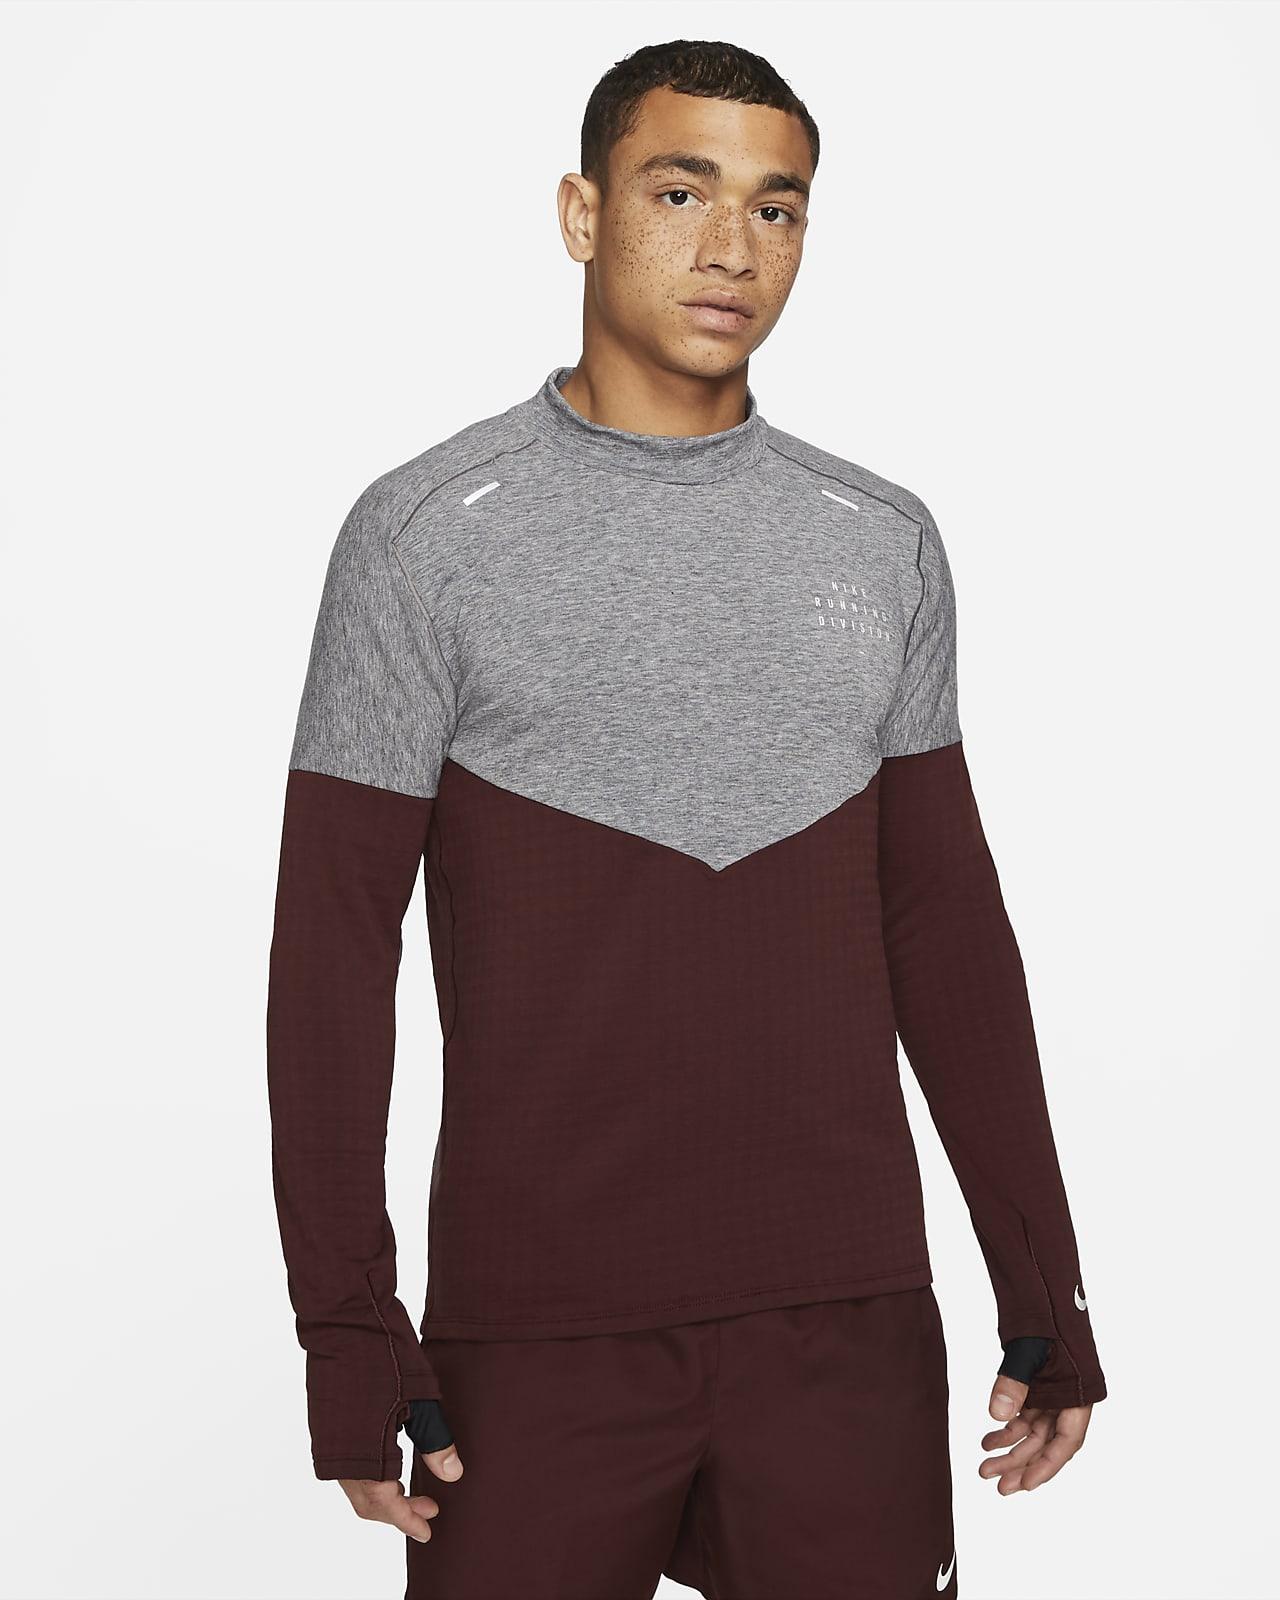 Nike Sphere Run Division Camiseta de running de lana - Hombre